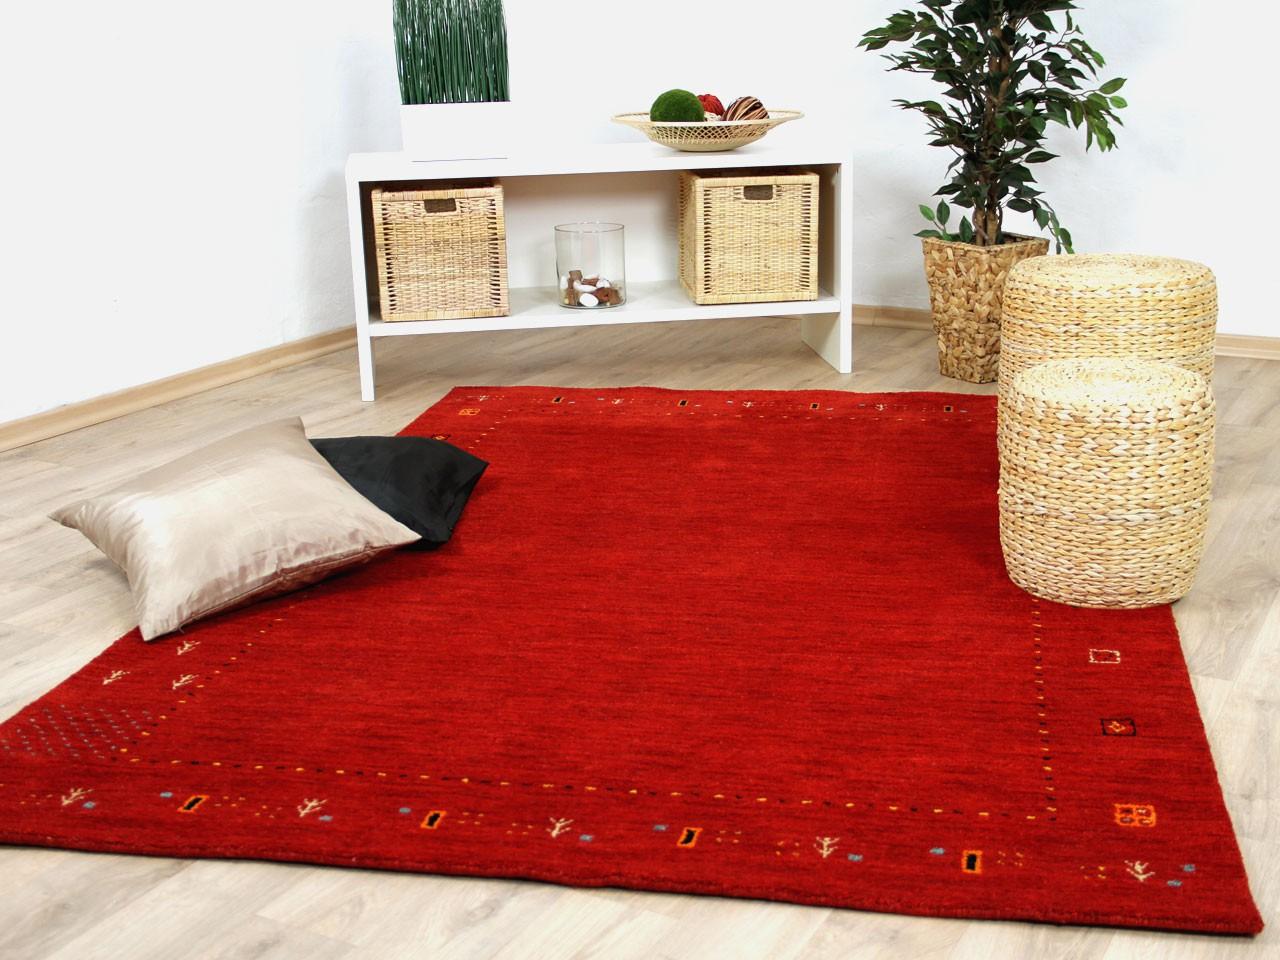 natur teppich indo gabbeh indira rot teppiche nepal gabbeh und kelim teppiche indo gabbeh teppiche. Black Bedroom Furniture Sets. Home Design Ideas